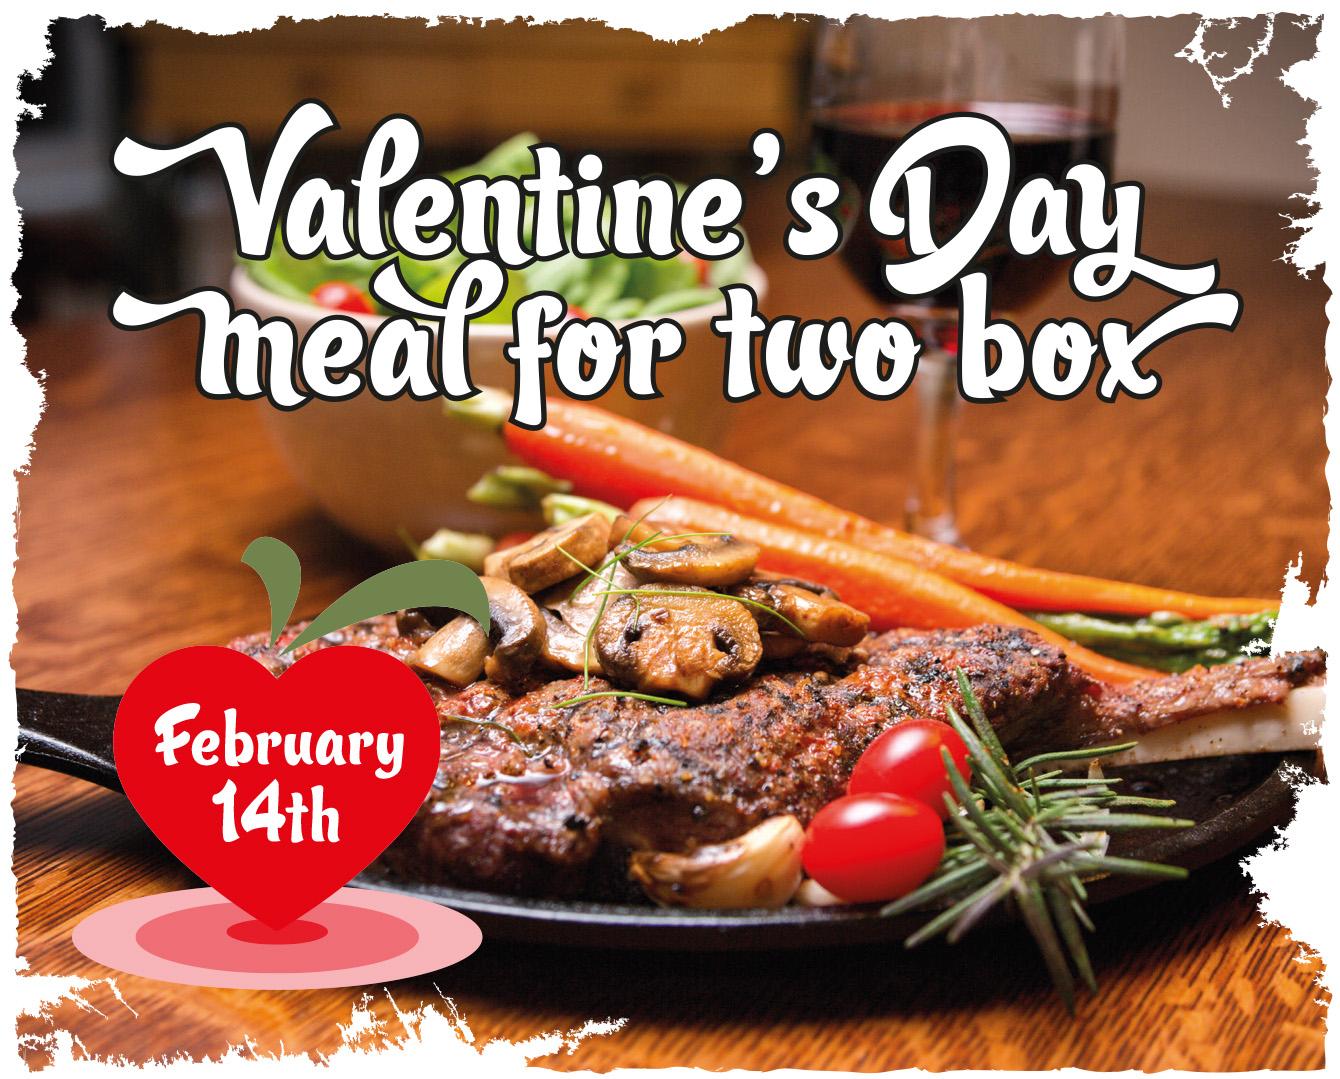 Valentine's Day Box for 2